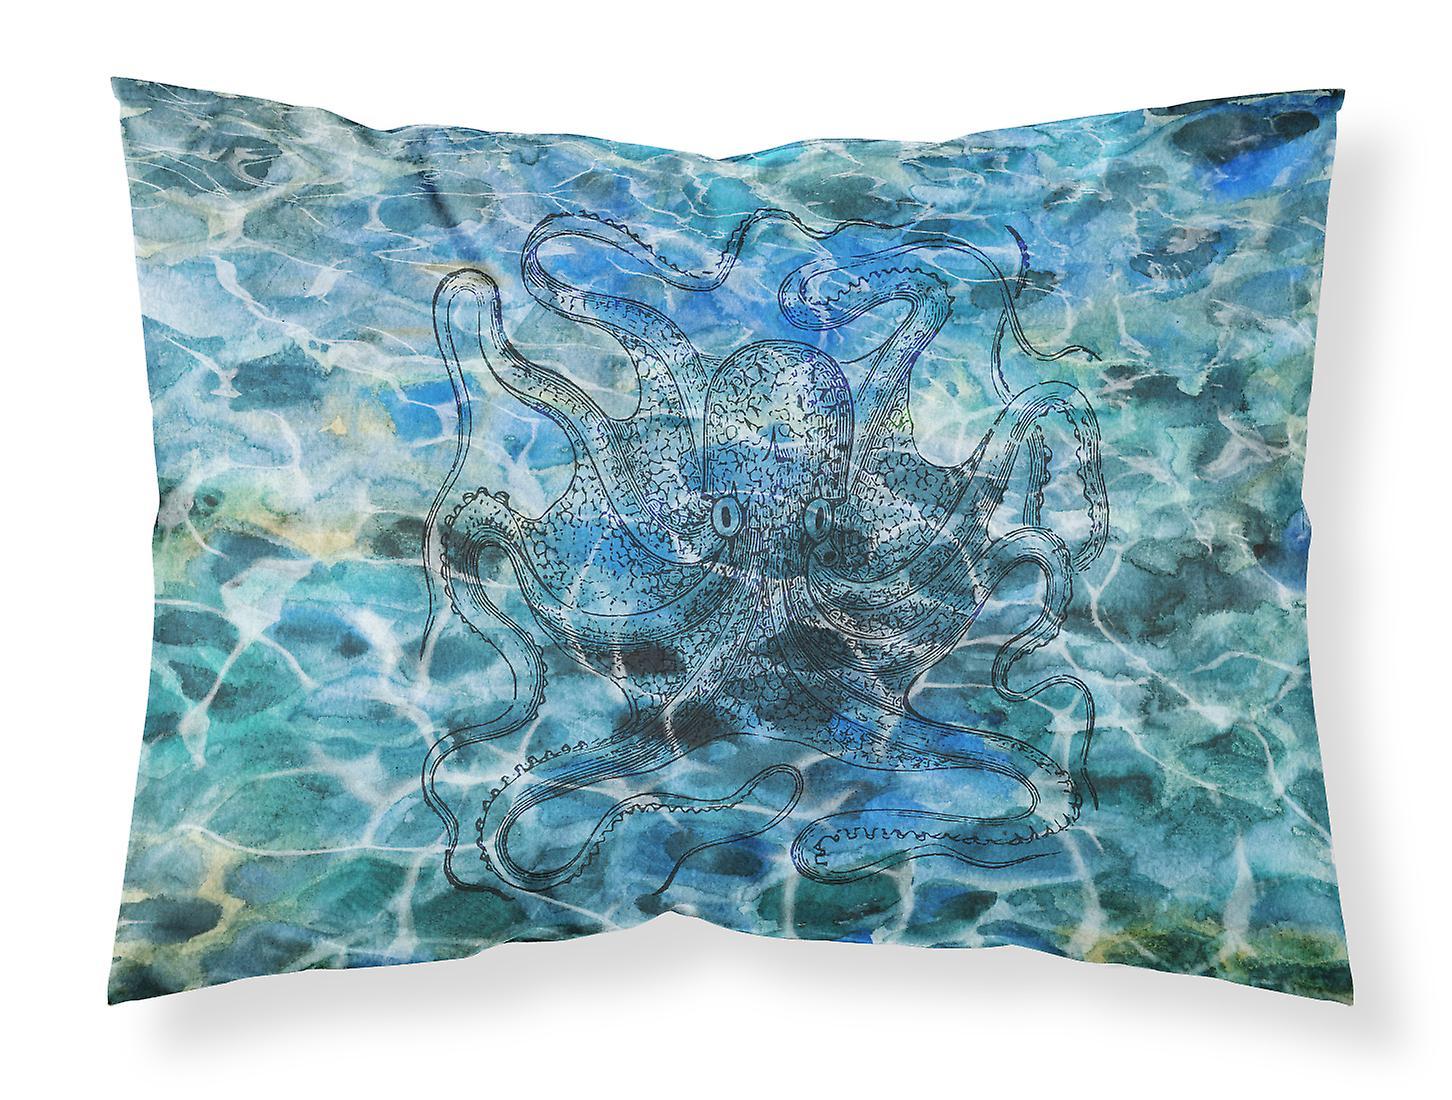 Standard Octopus D'oreiller Taie Sous Tissu L'eau 8n0mONwv